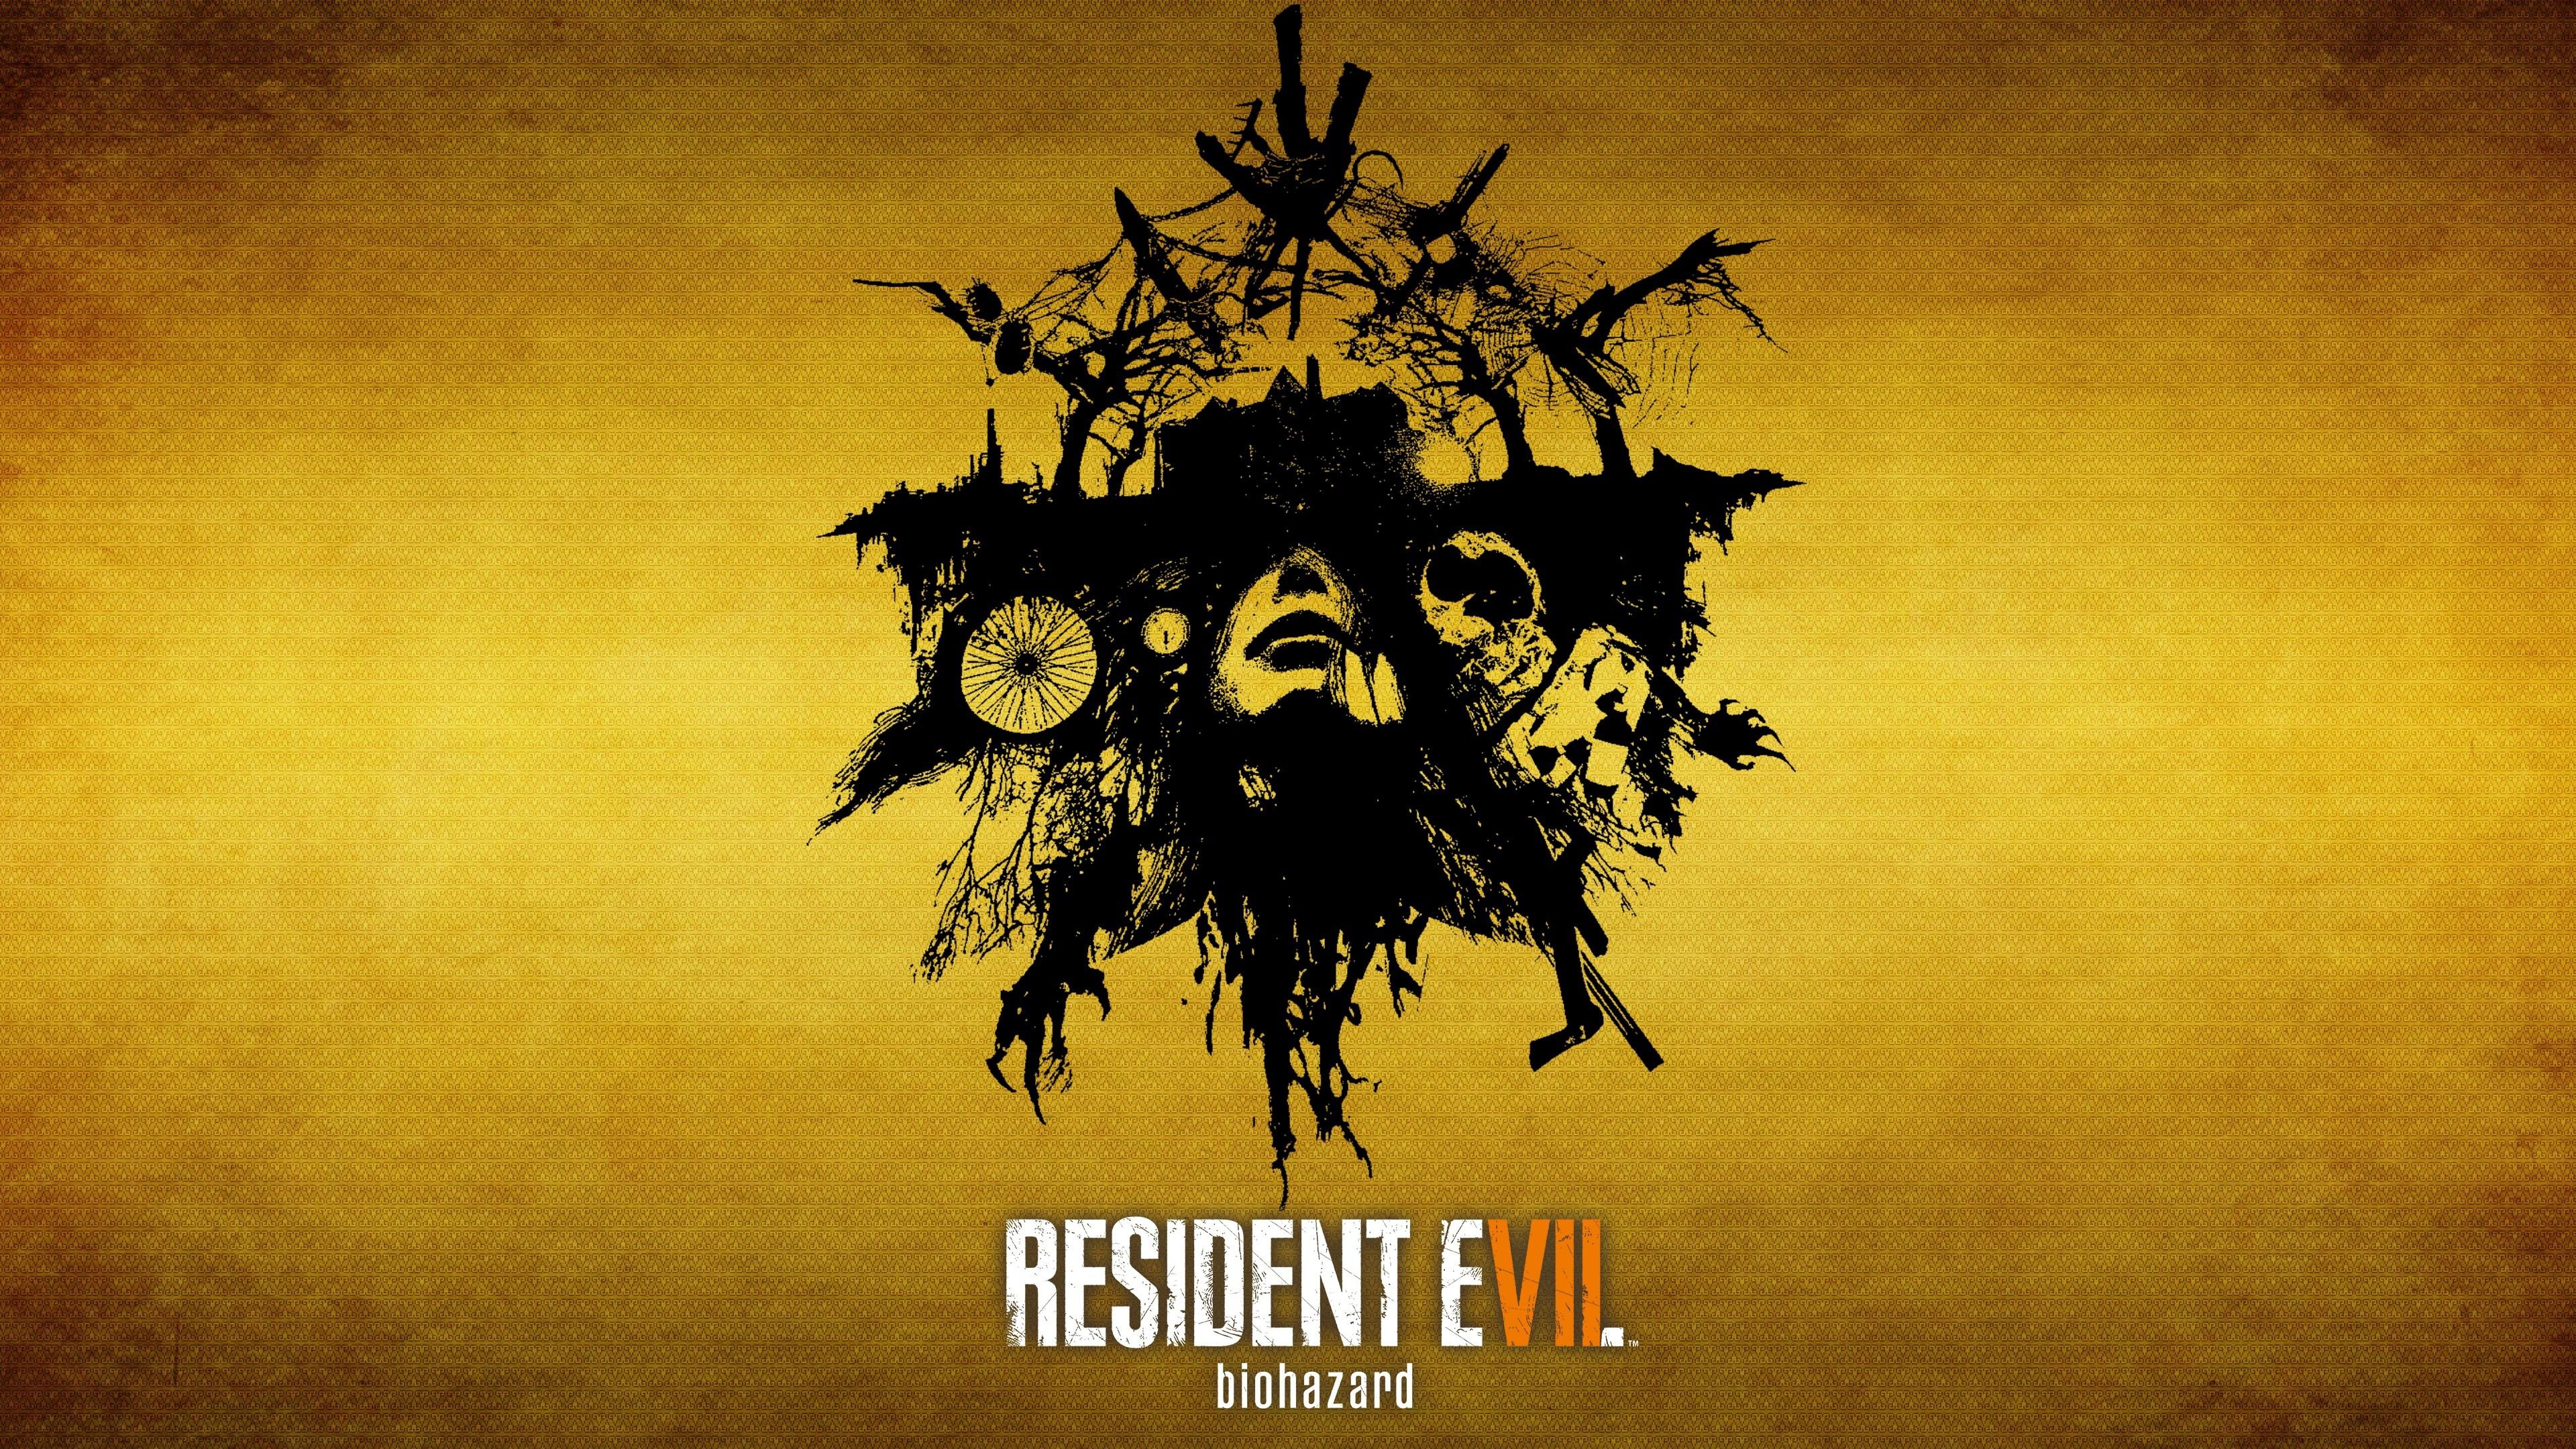 Resident Evil 7 Hd Wallpaper: Resident Evil 7 Biohazard, HD Games, 4k Wallpapers, Images